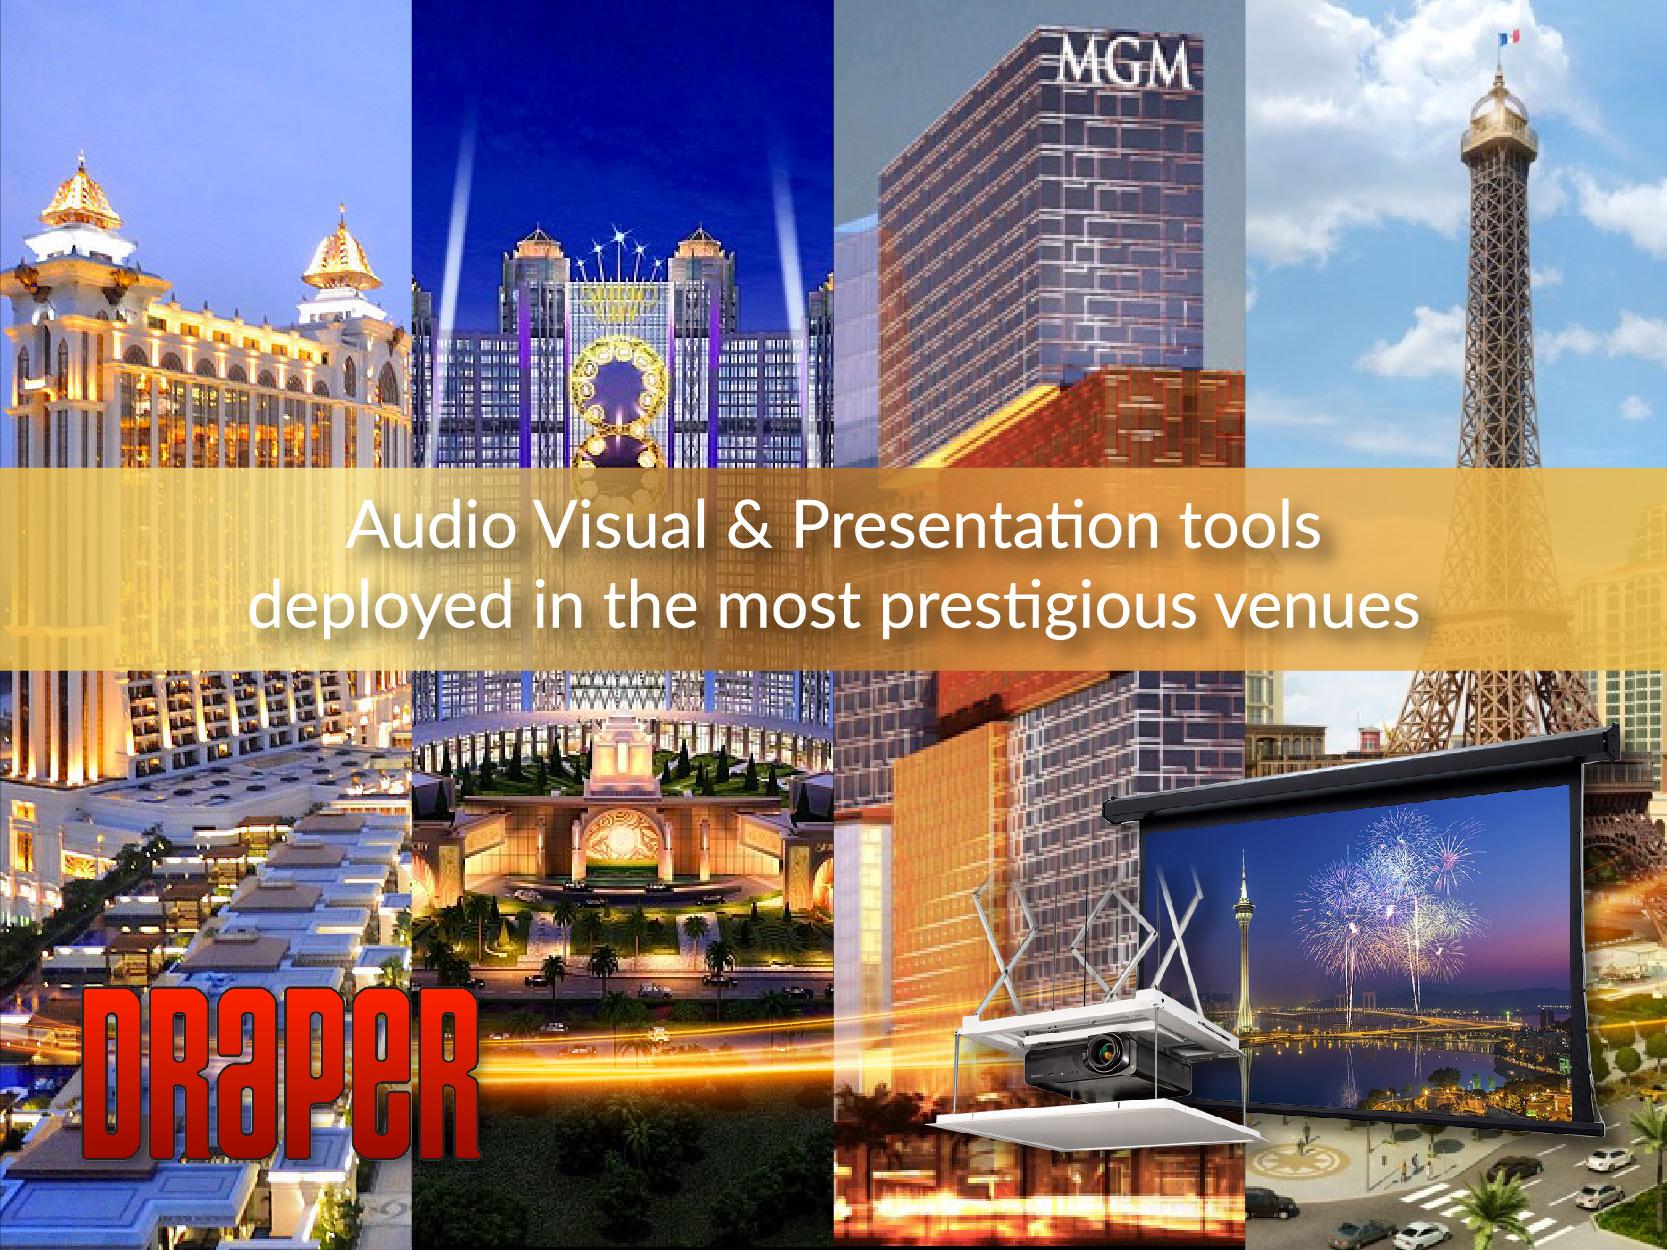 Macau_Casinos_Draper_m-20